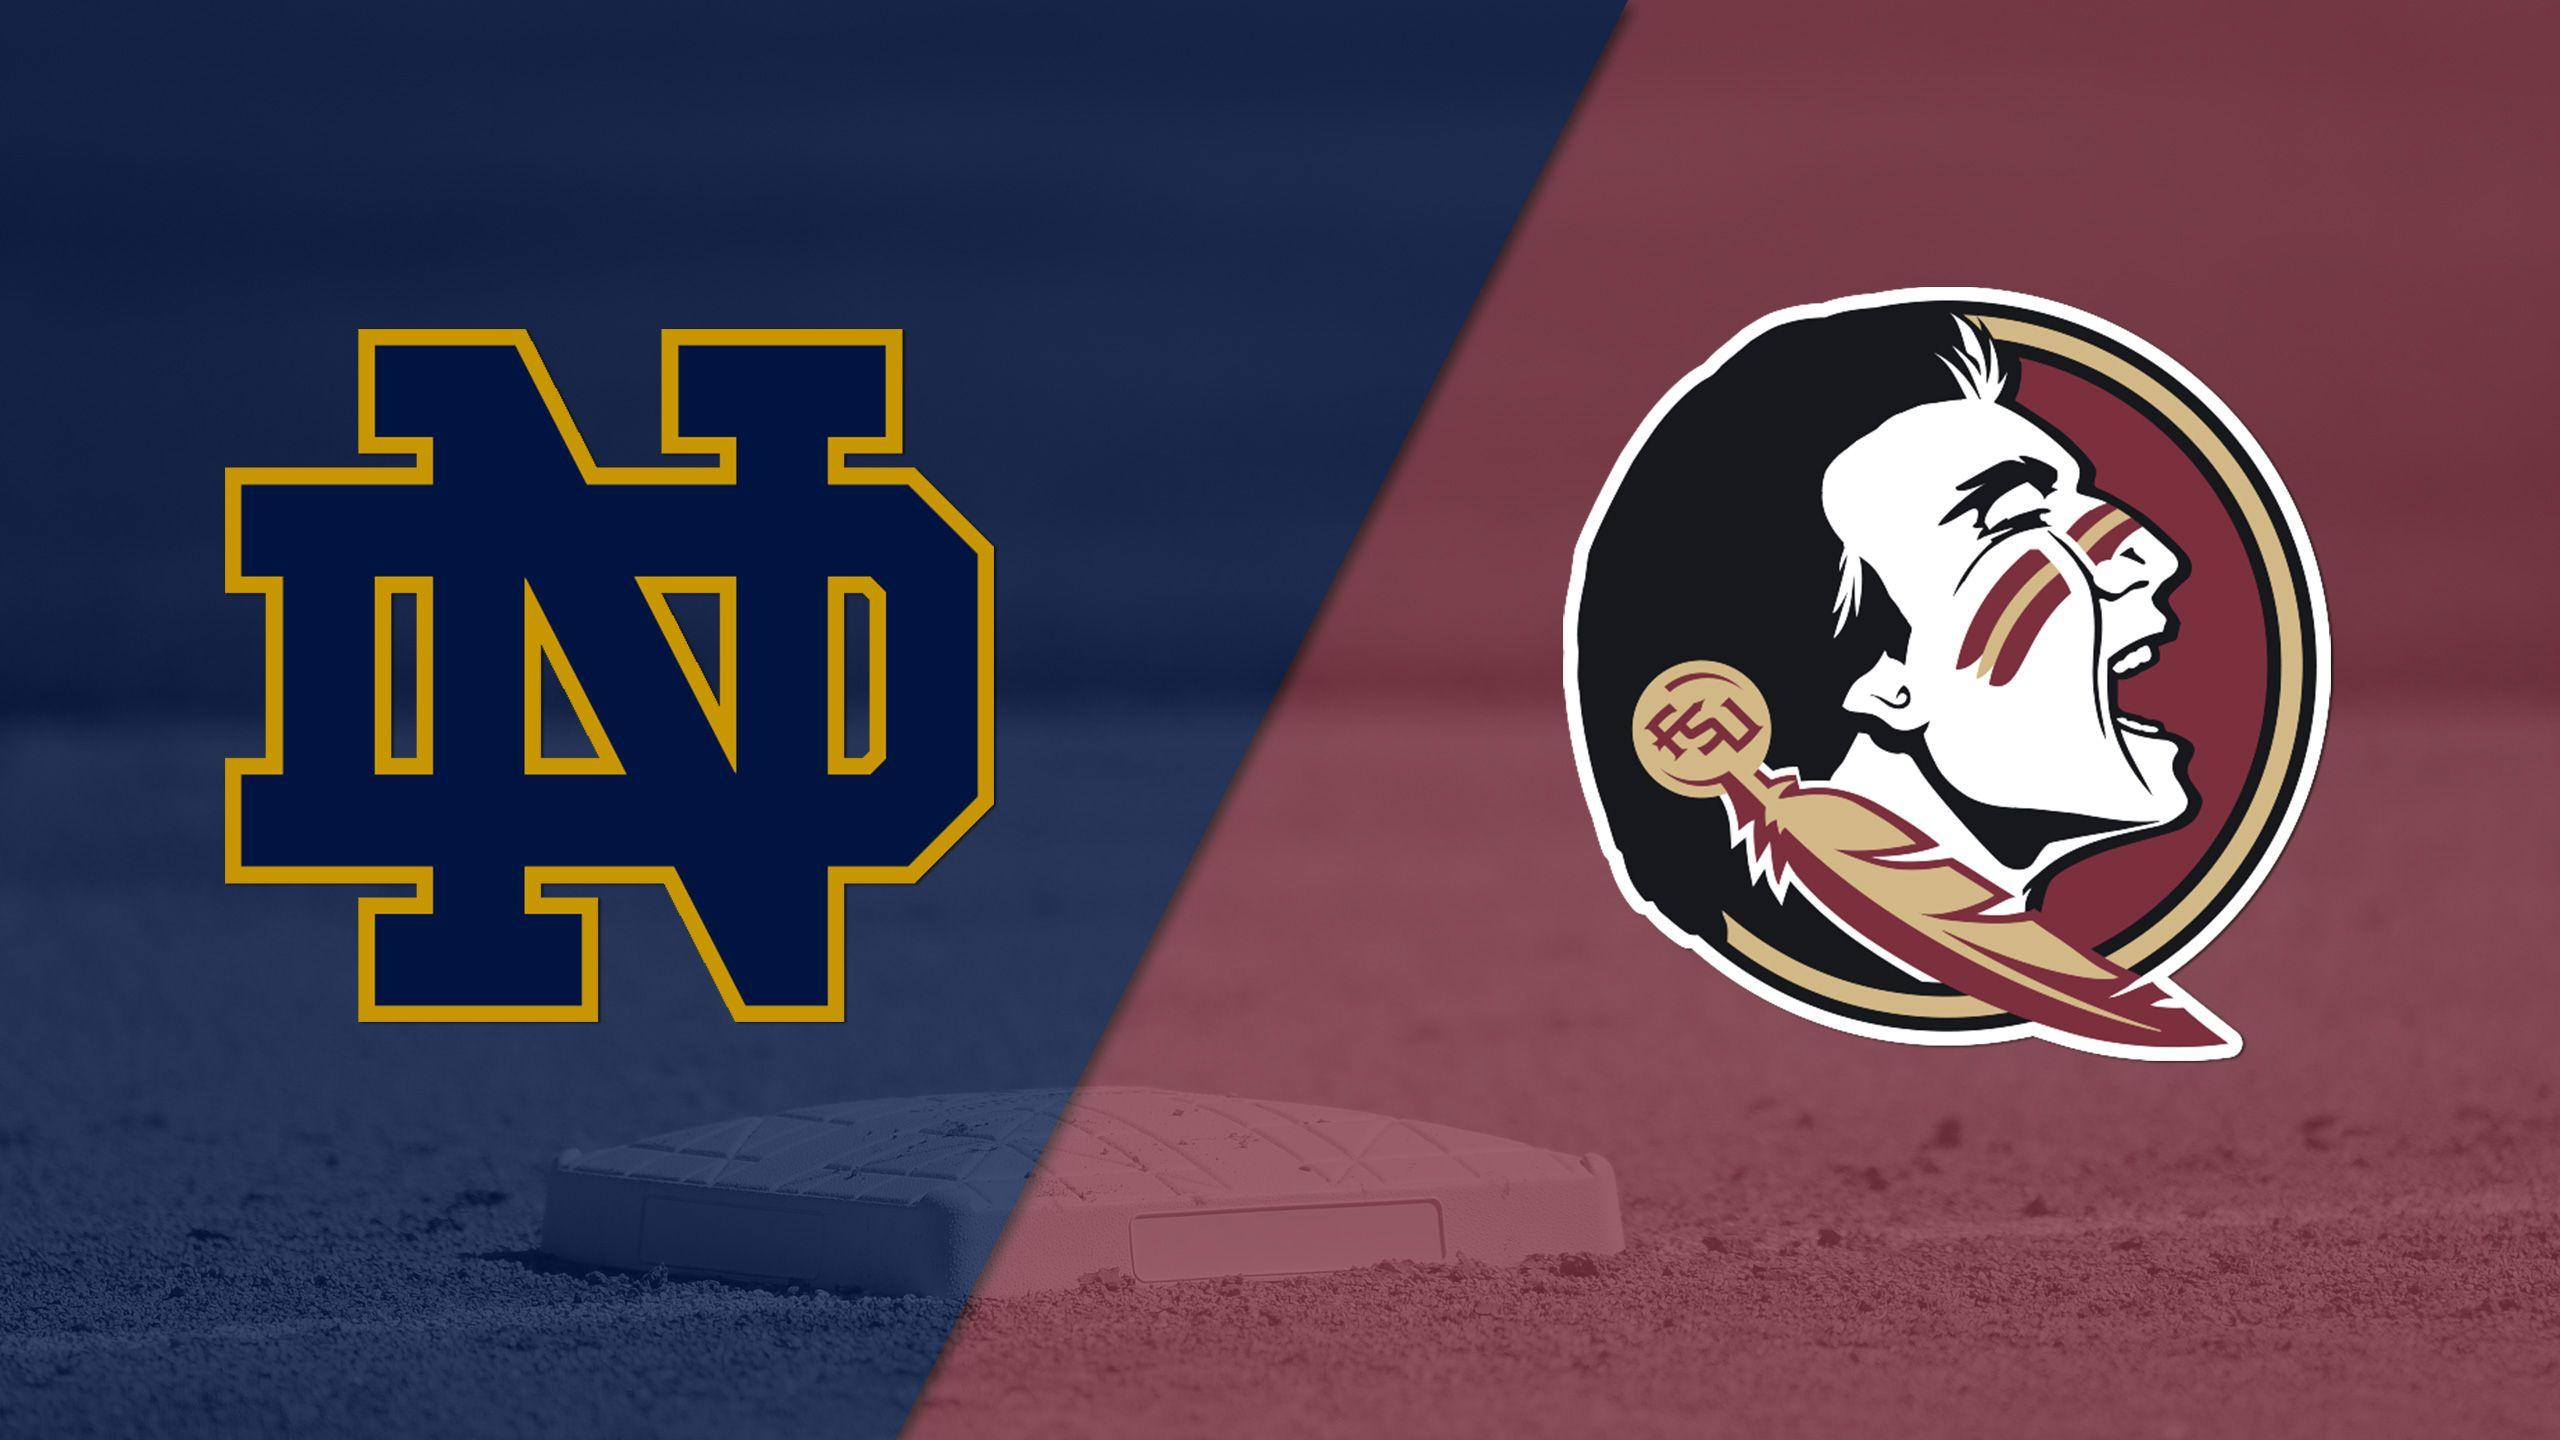 Notre Dame vs. #2 Florida State (Softball)